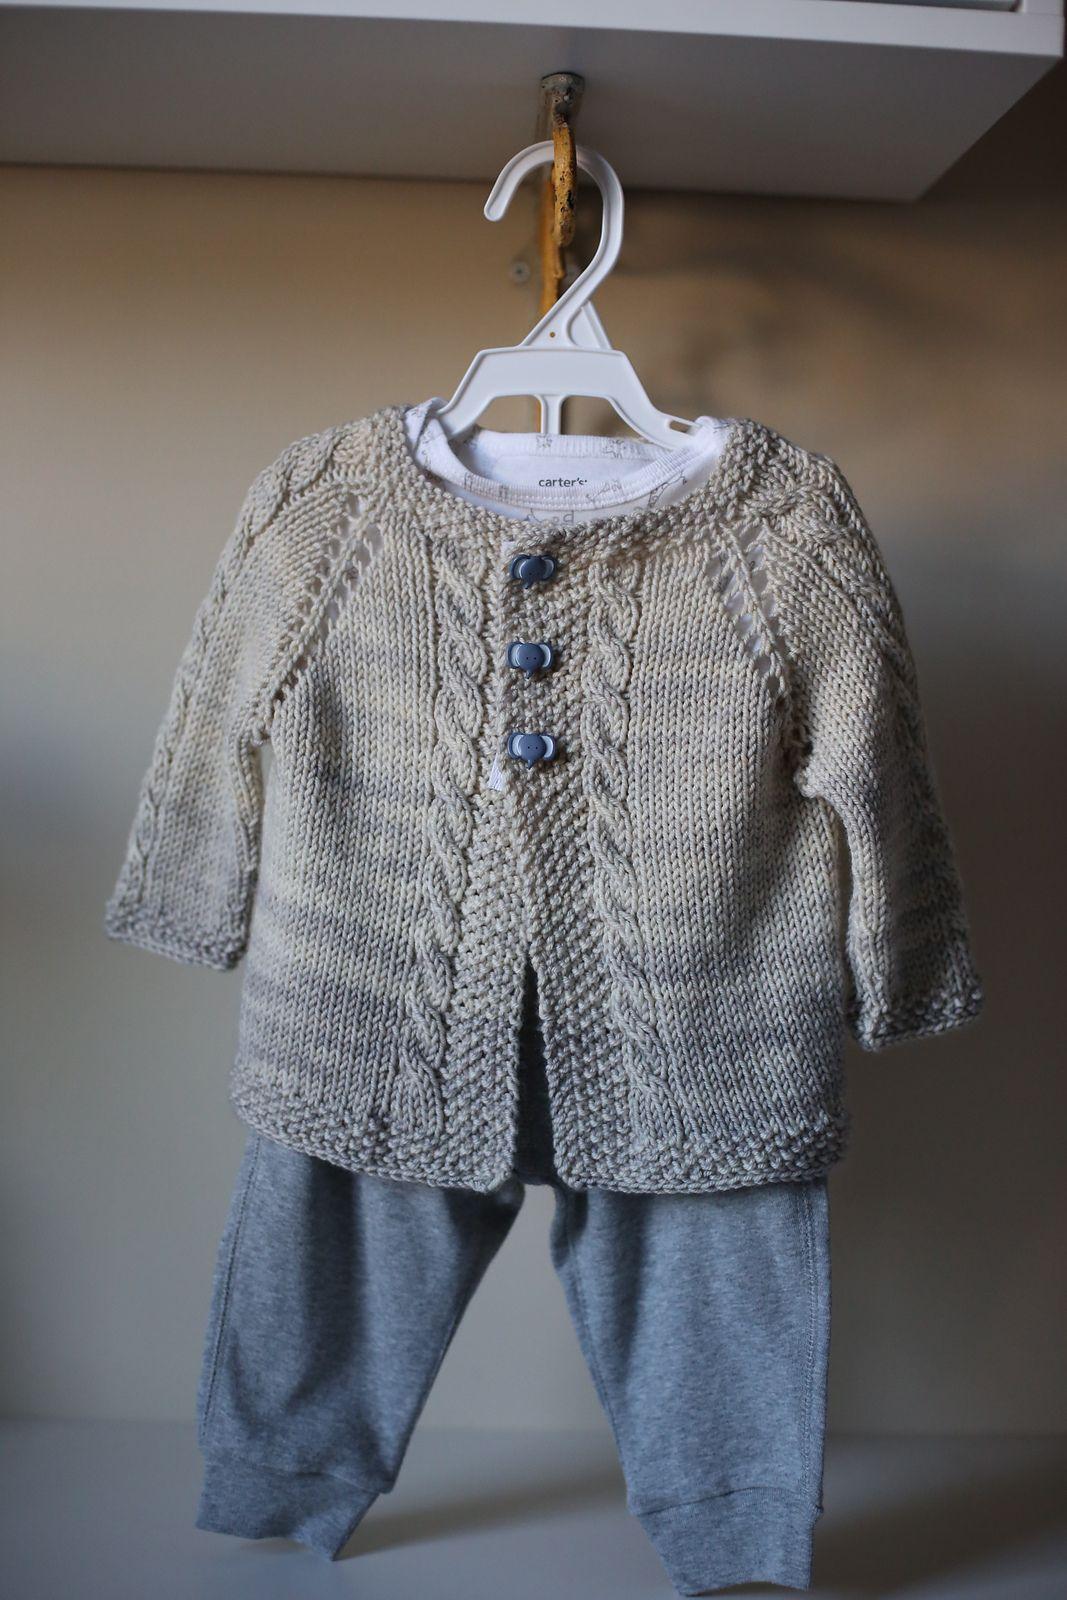 Vintage Cardigan pattern by Helen Rose | Knit baby ...